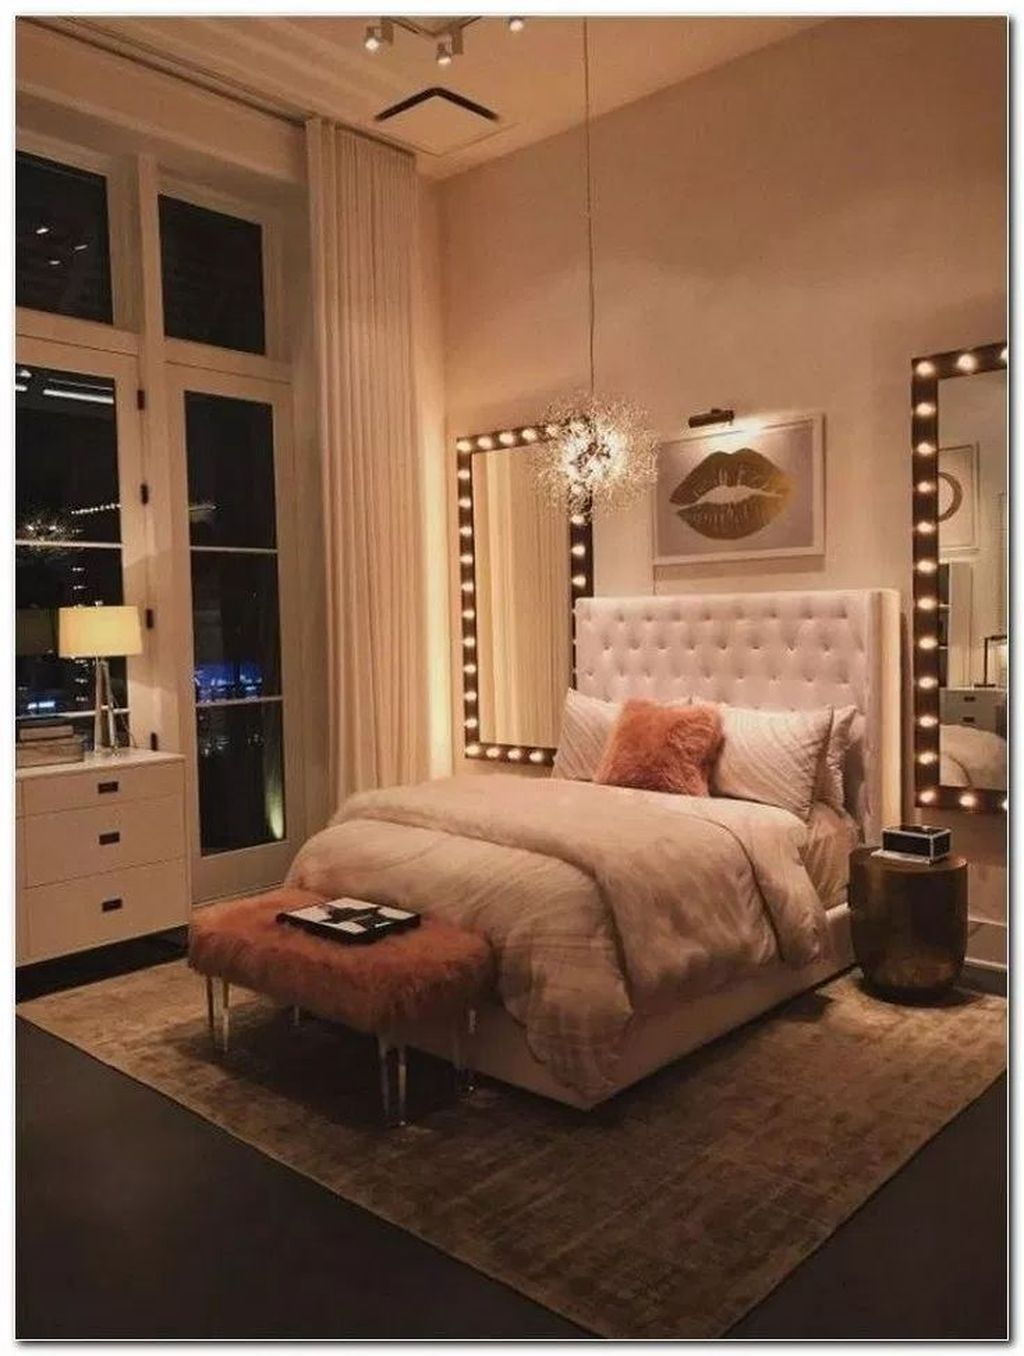 32 Fabulous Small Apartment Bedroom Design Ideas Homyhomee In 2020 Small Apartment Room Simple Bedroom Apartment Room